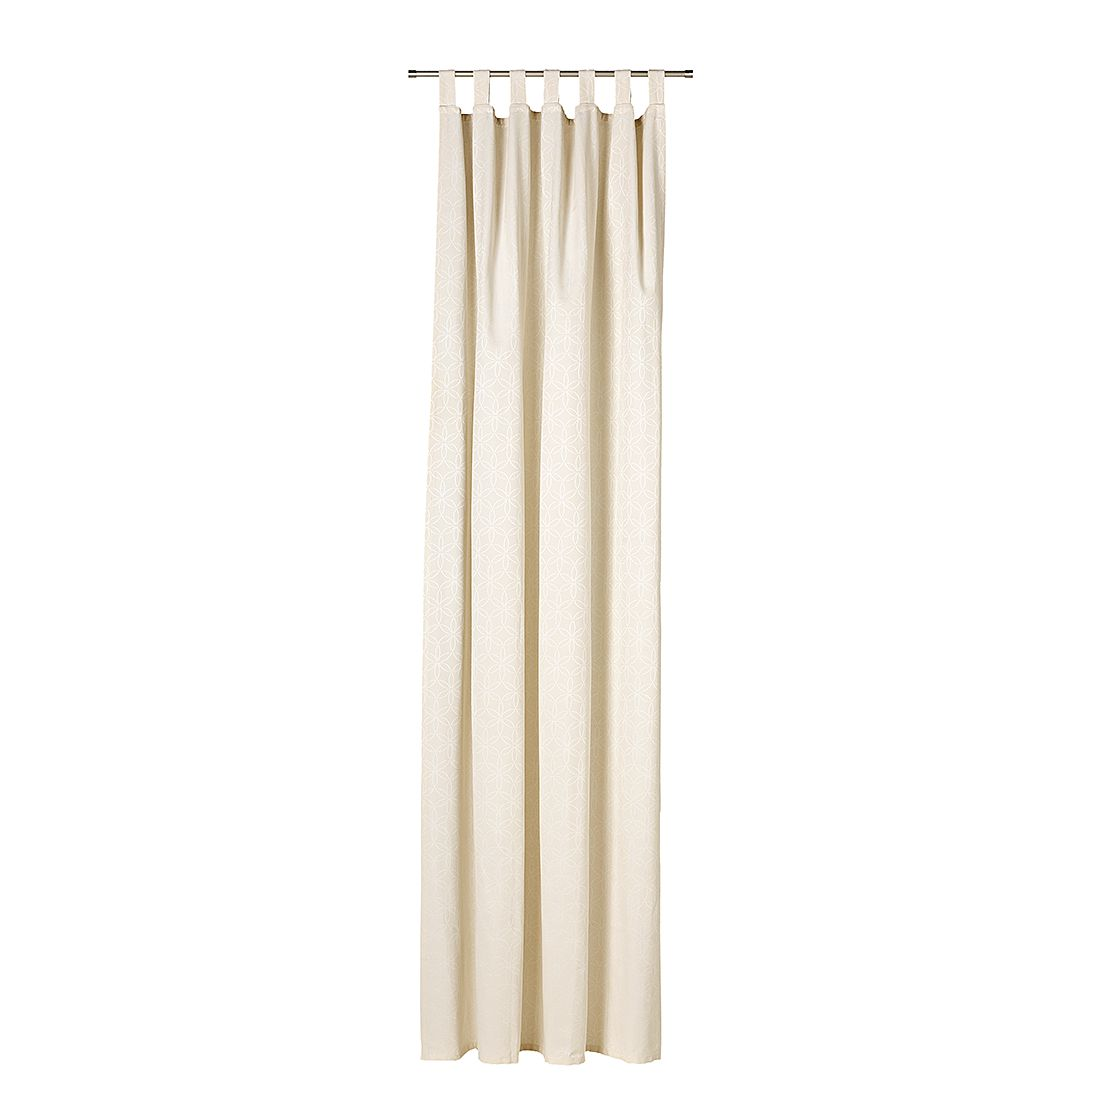 rideau 45 cm jusqu 70 pureshopping. Black Bedroom Furniture Sets. Home Design Ideas